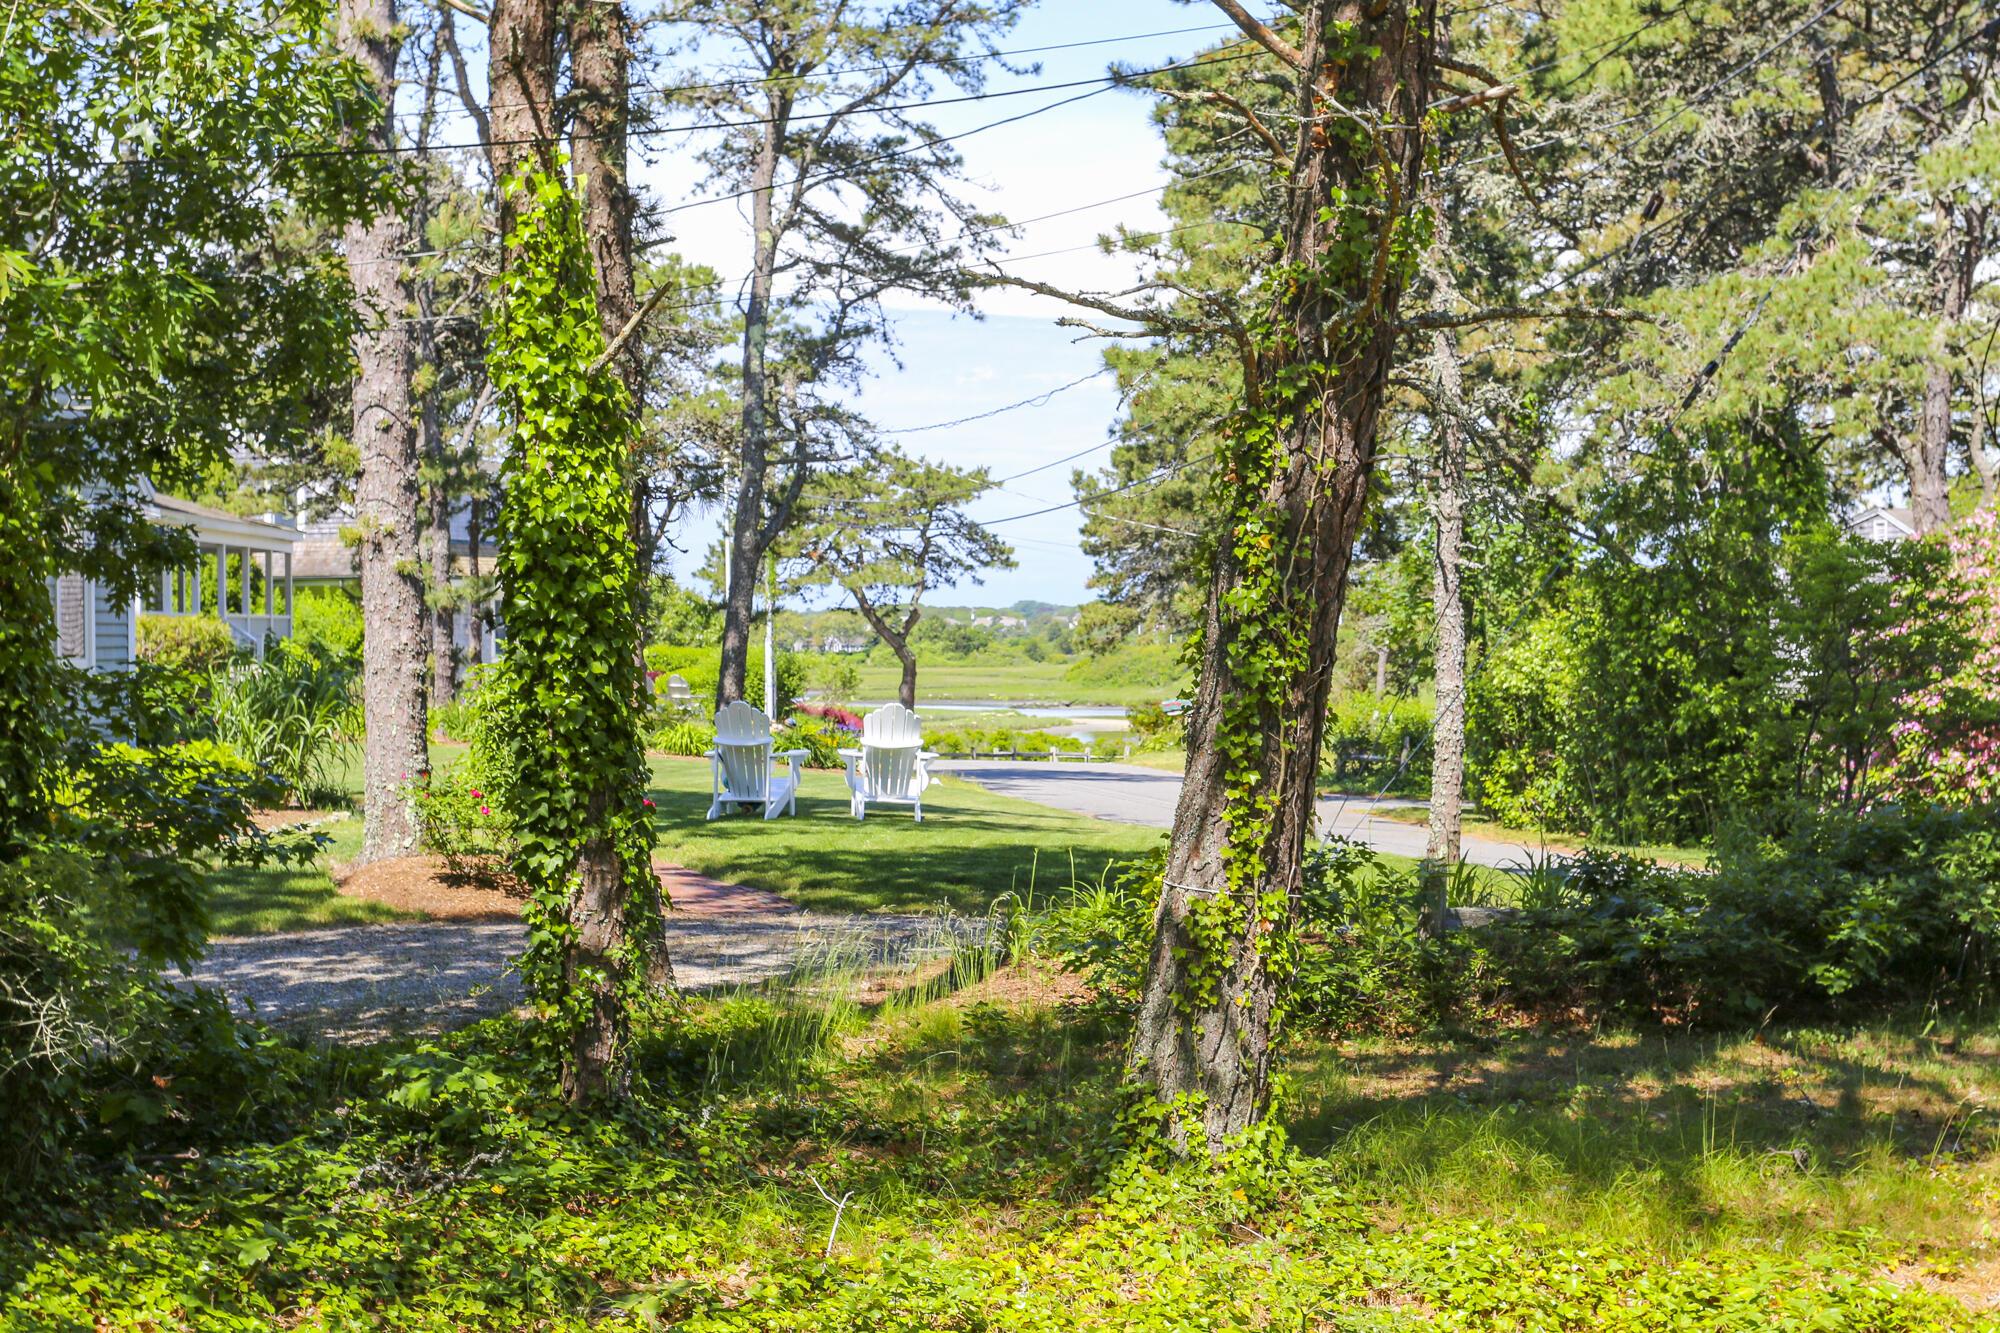 117 Bucks Creek Road, Chatham MA, 02633 - slide 2